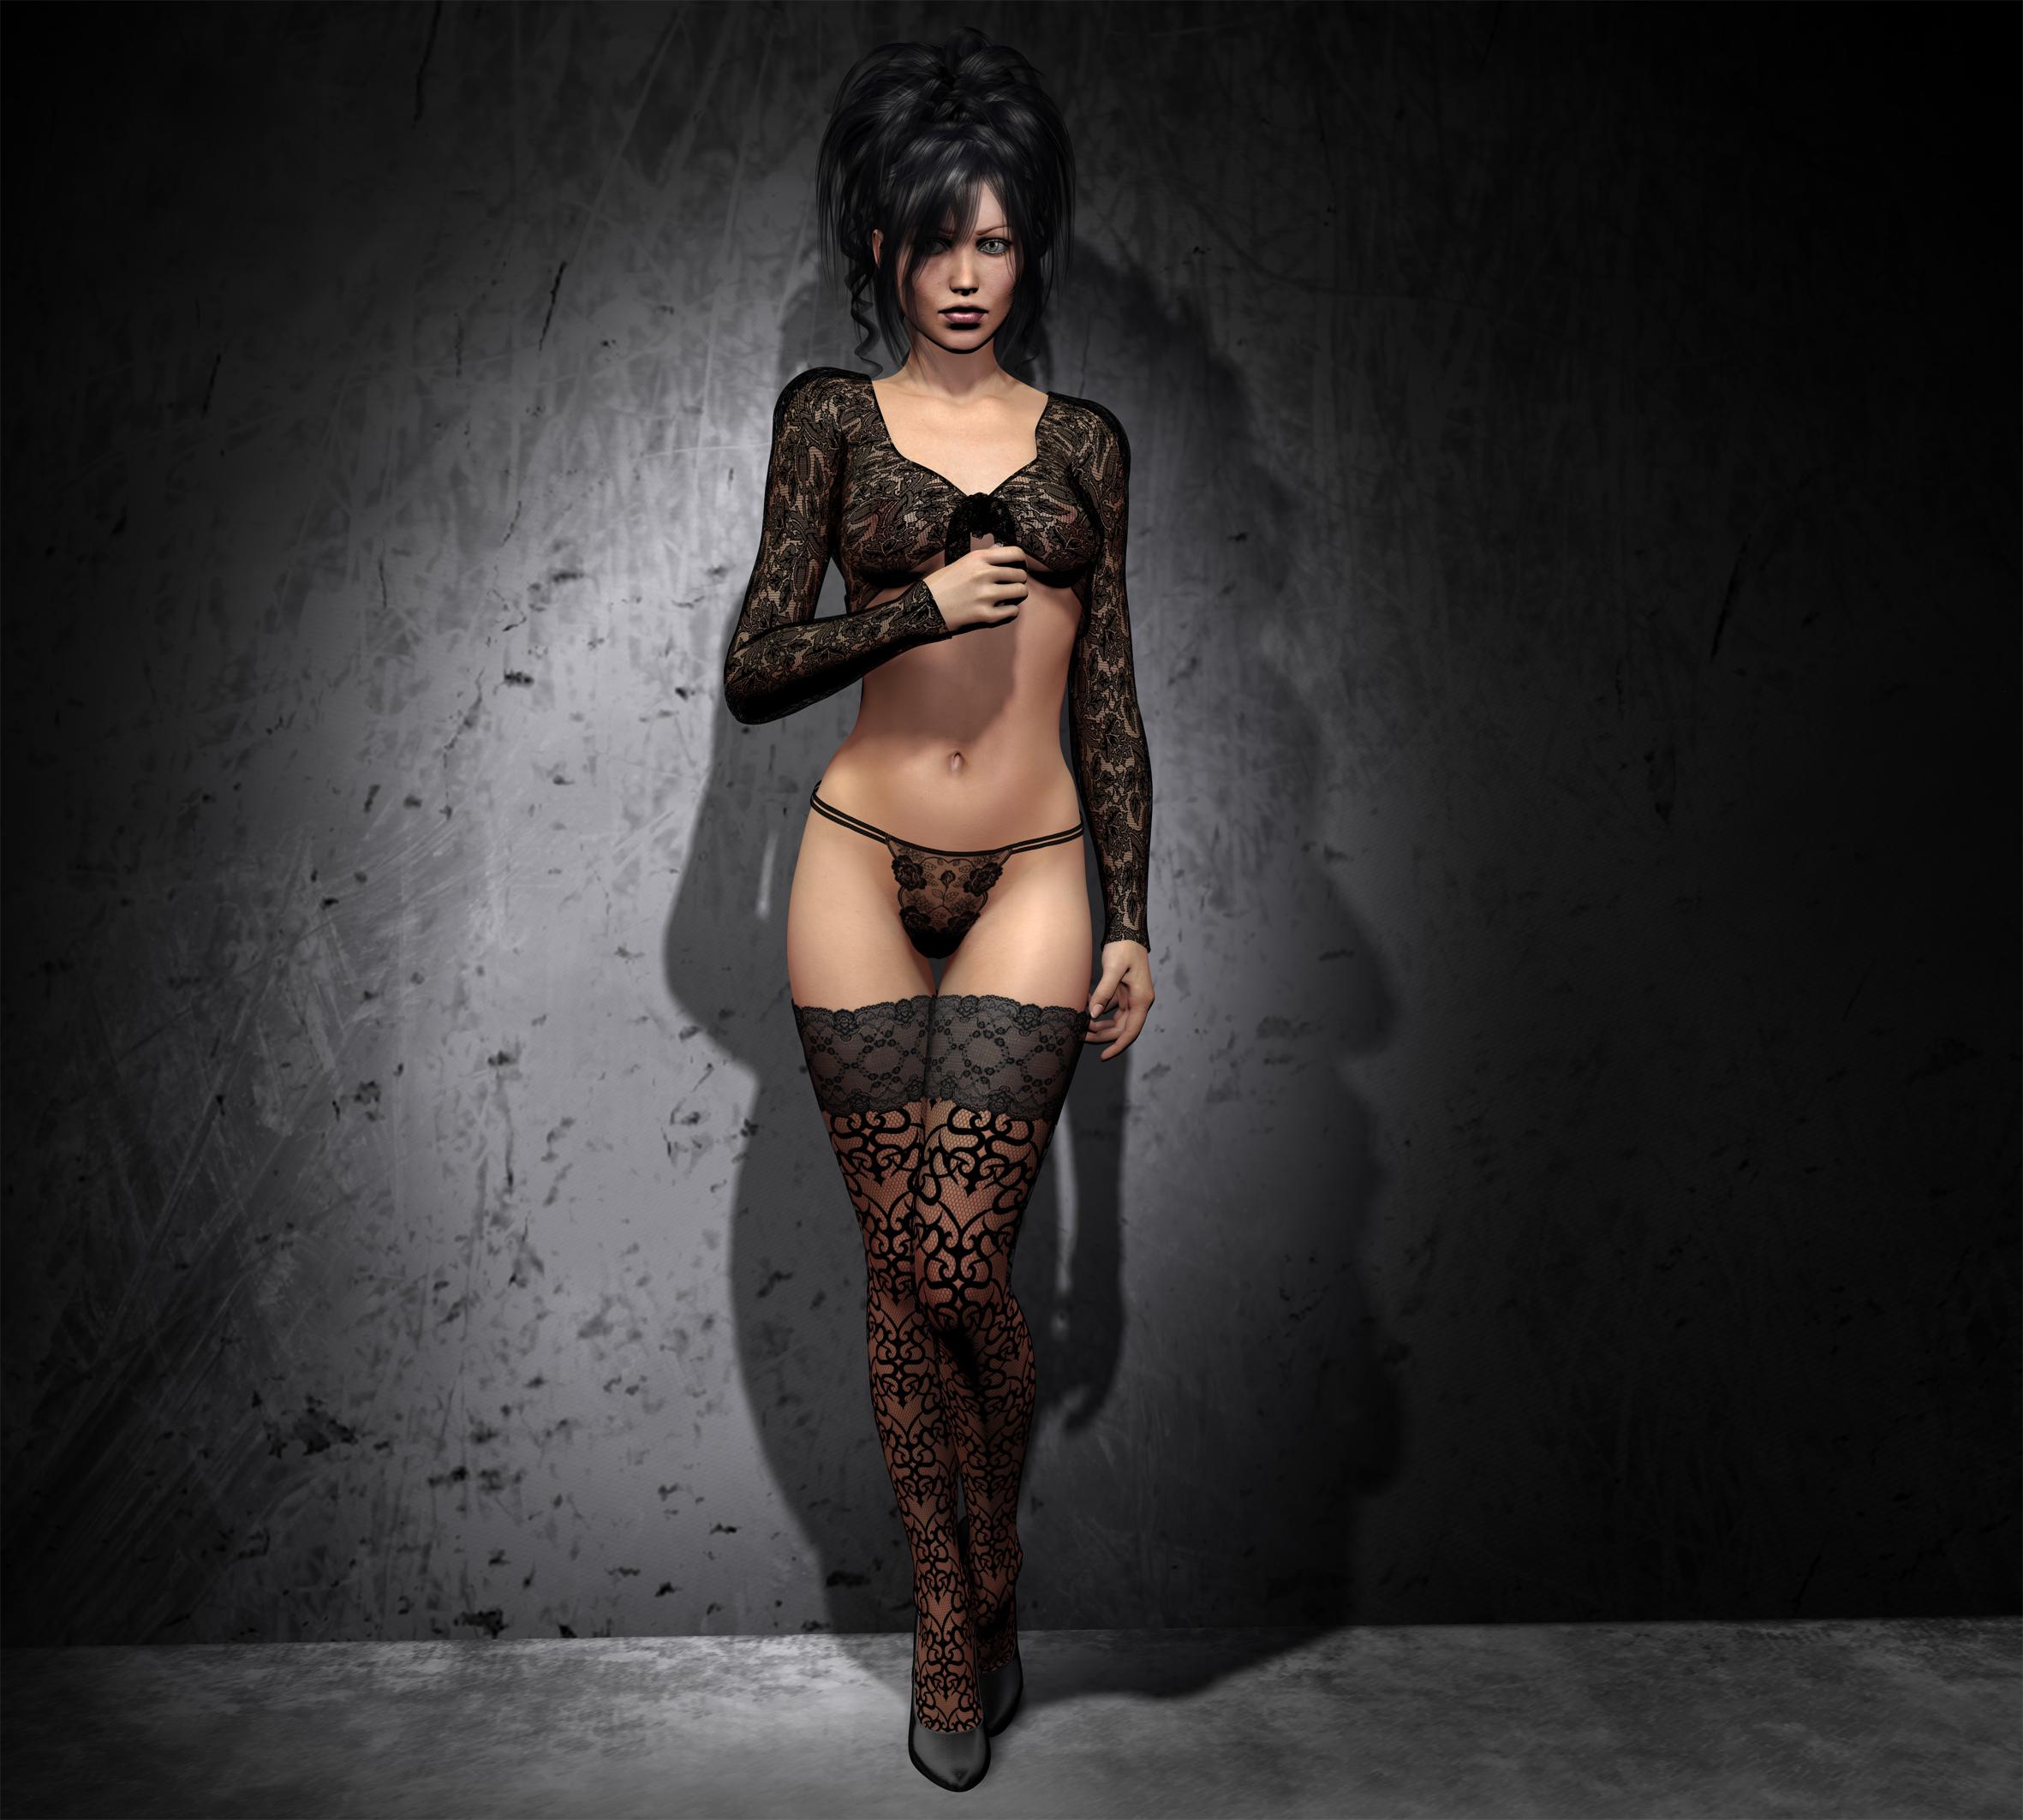 deviantart sexy wallpaper - photo #7